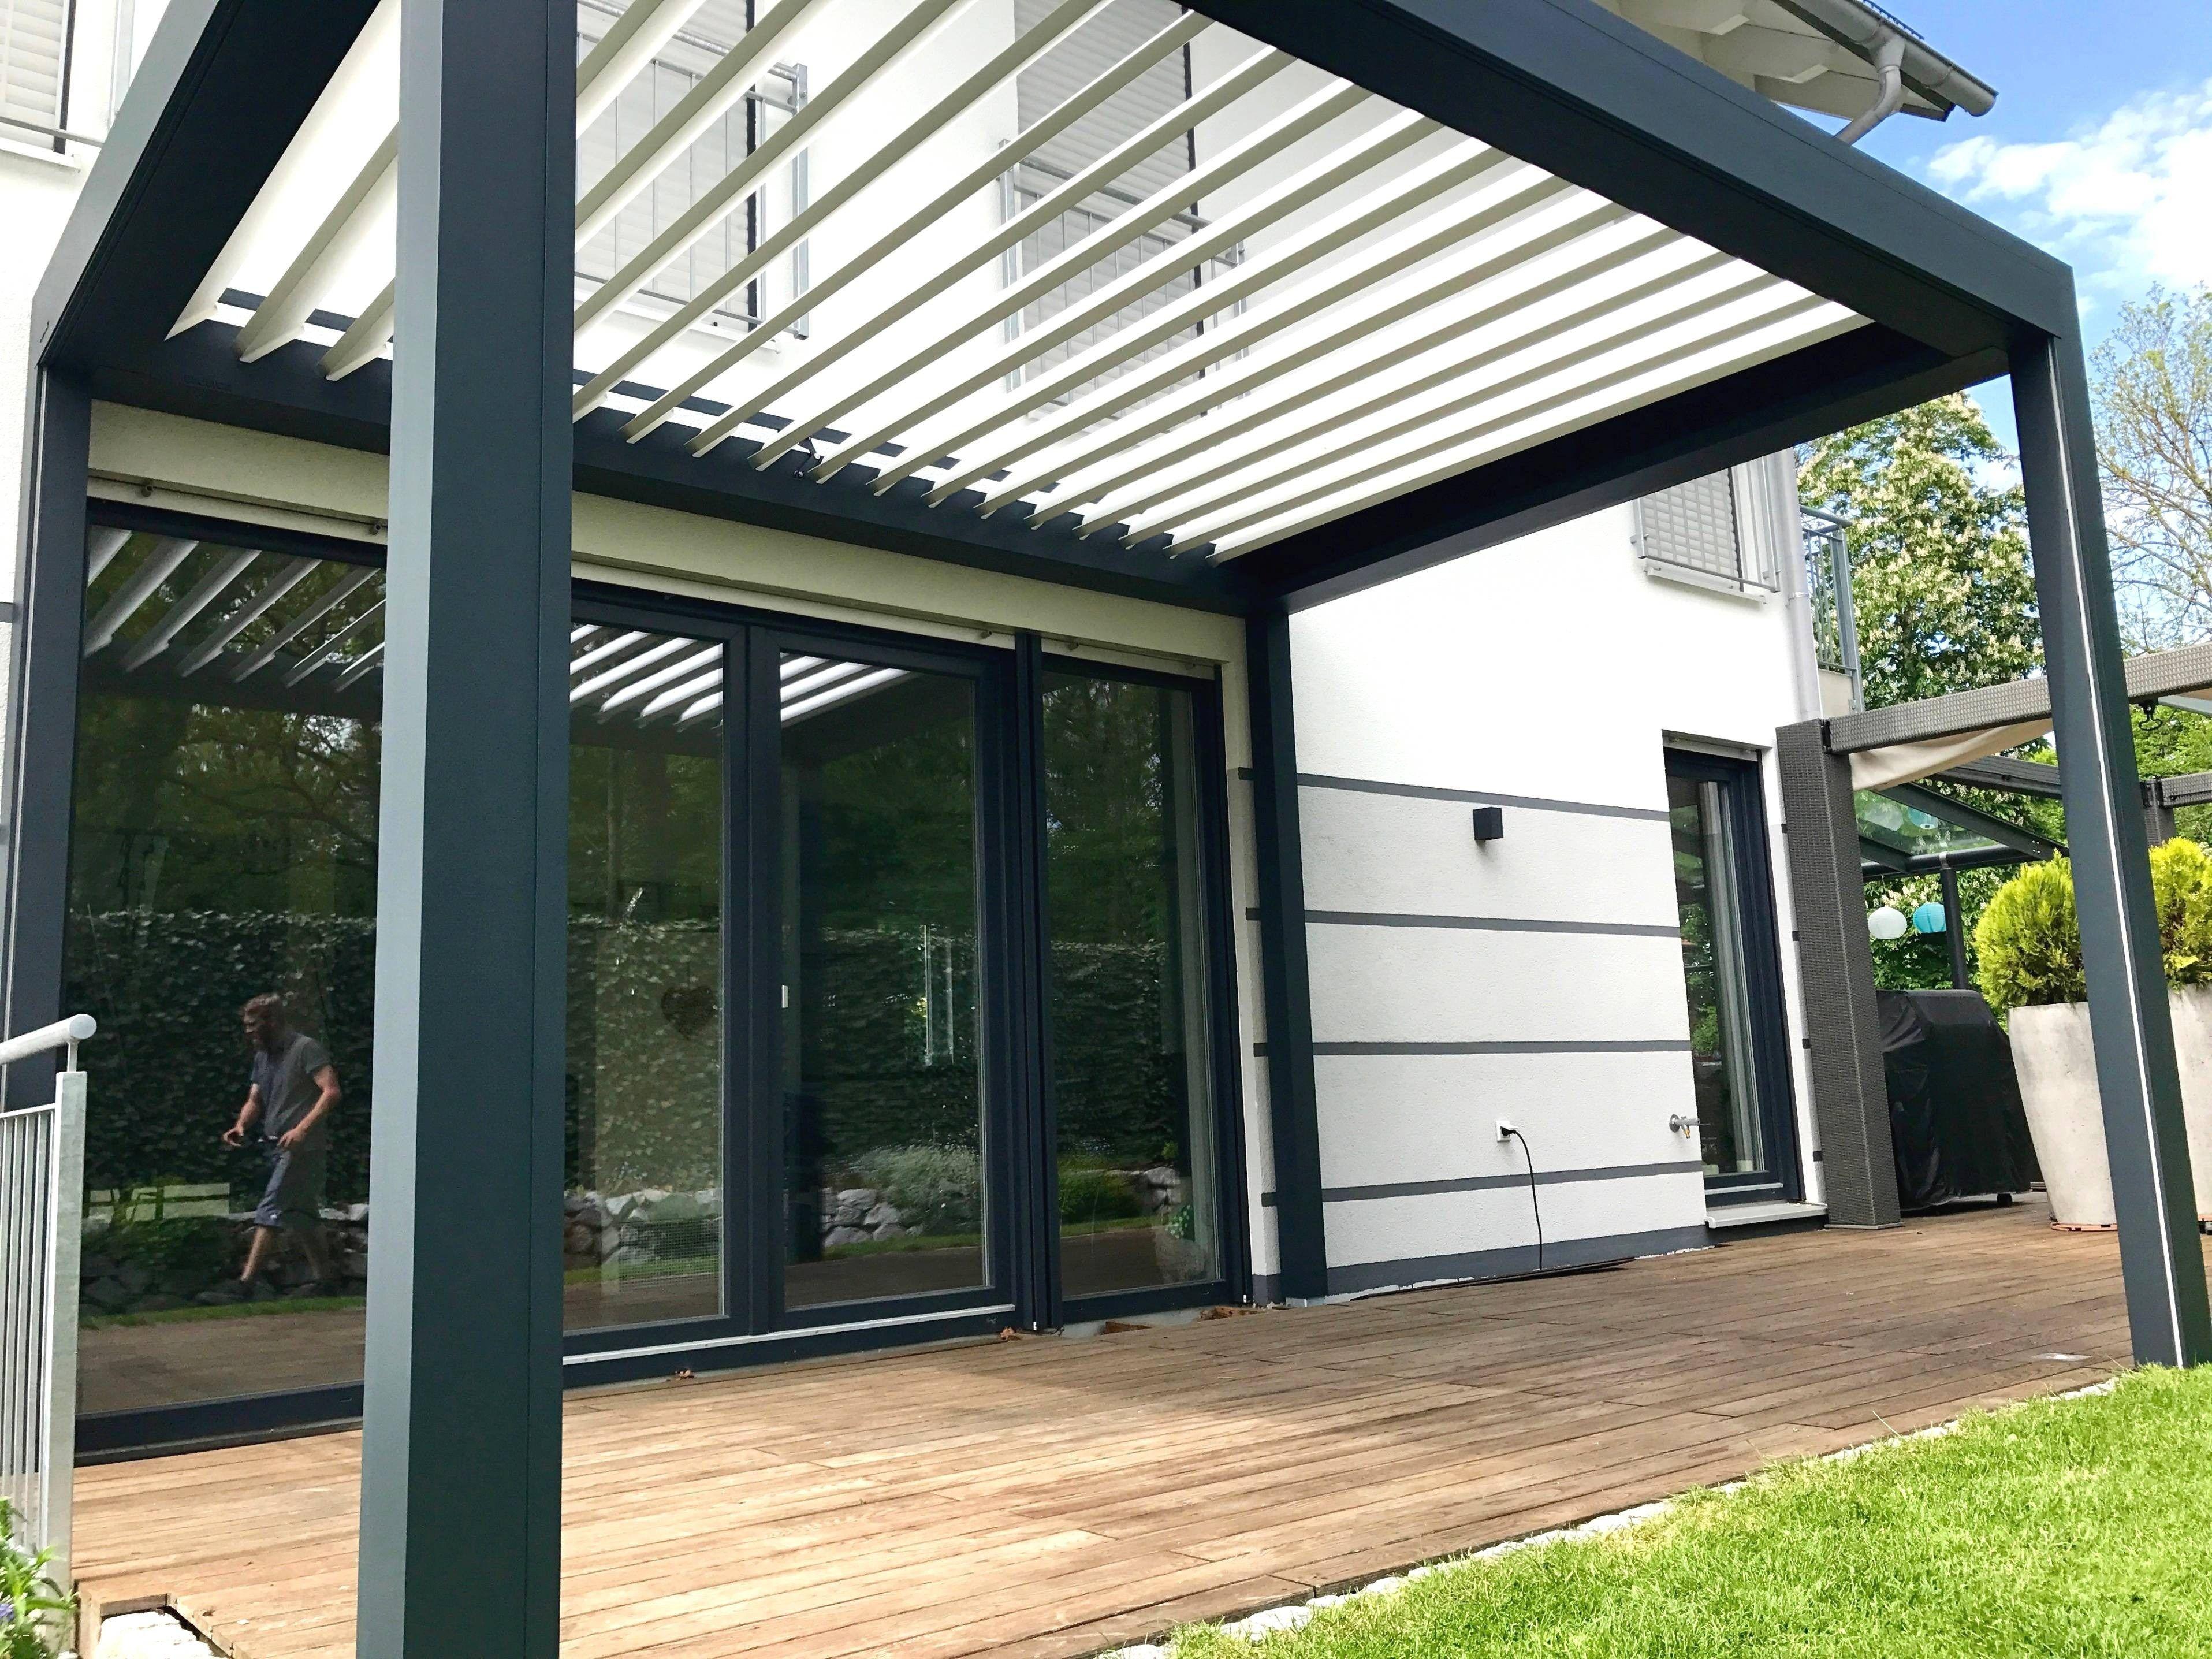 Best Of Wintergarten Balkon Einrichten Outdoor pergola